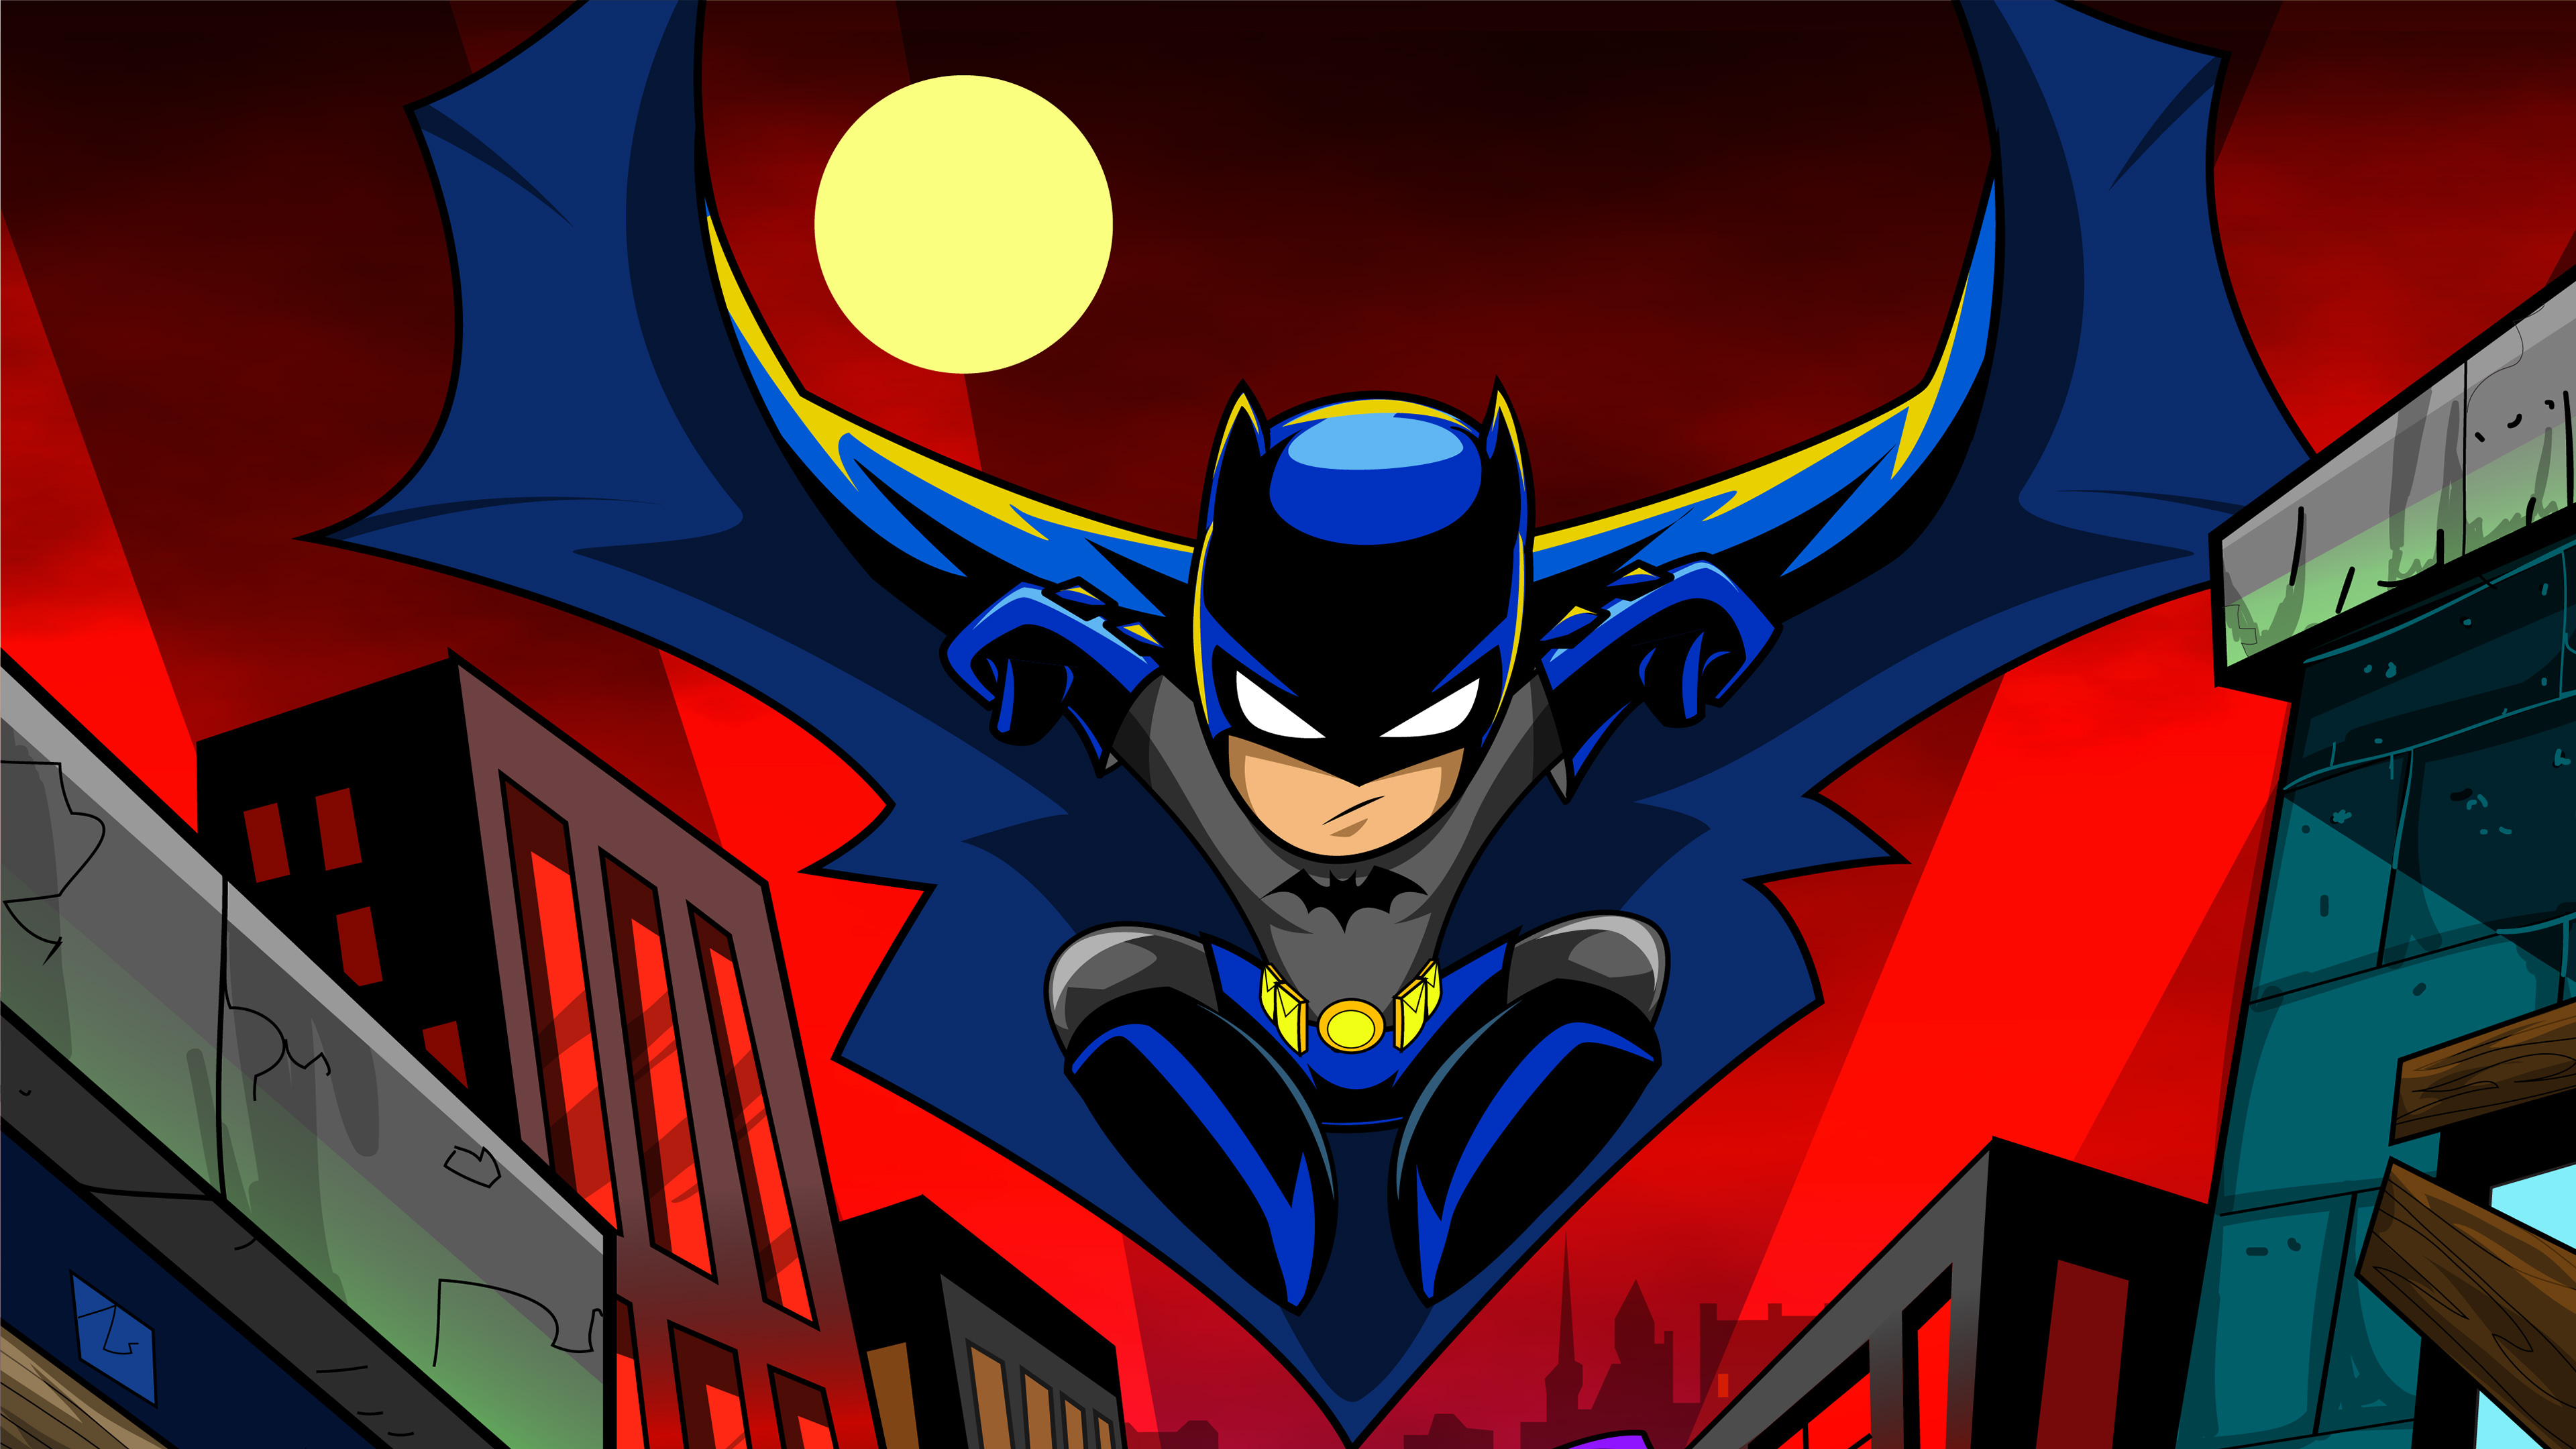 batman cartoon art 4k 1538785831 - Batman Cartoon Art 4k - superheroes wallpapers, hd-wallpapers, digital art wallpapers, cartoon wallpapers, behance wallpapers, batman wallpapers, artwork wallpapers, artist wallpapers, 4k-wallpapers